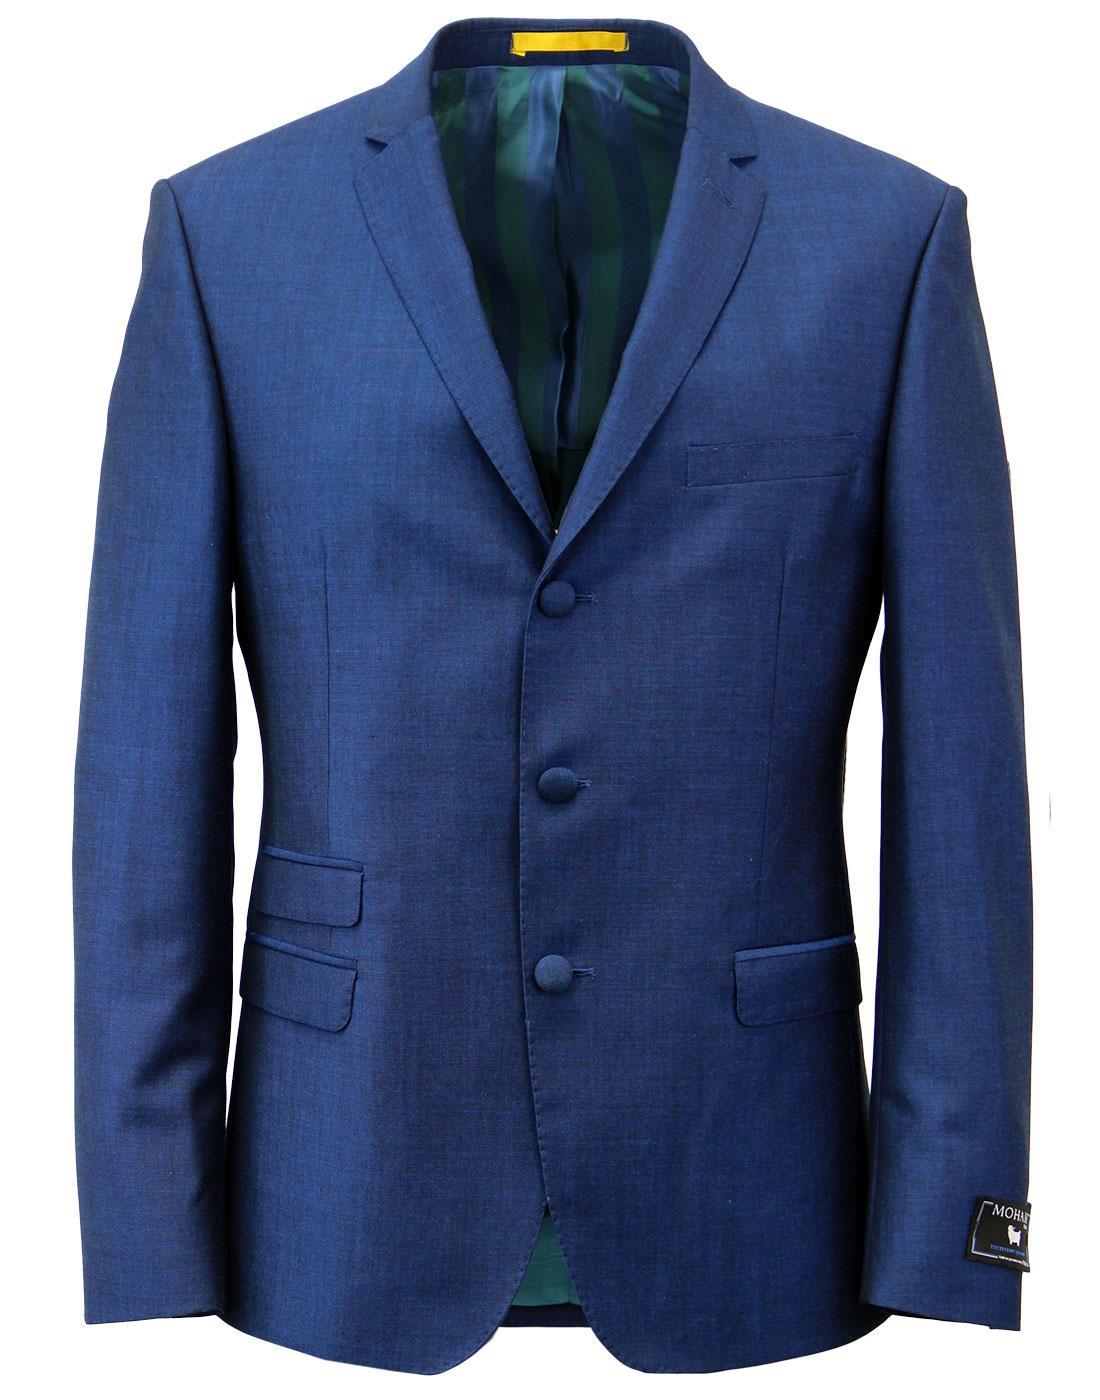 MADCAP ENGLAND 60s Mod Mohair Tonic Suit Jacket